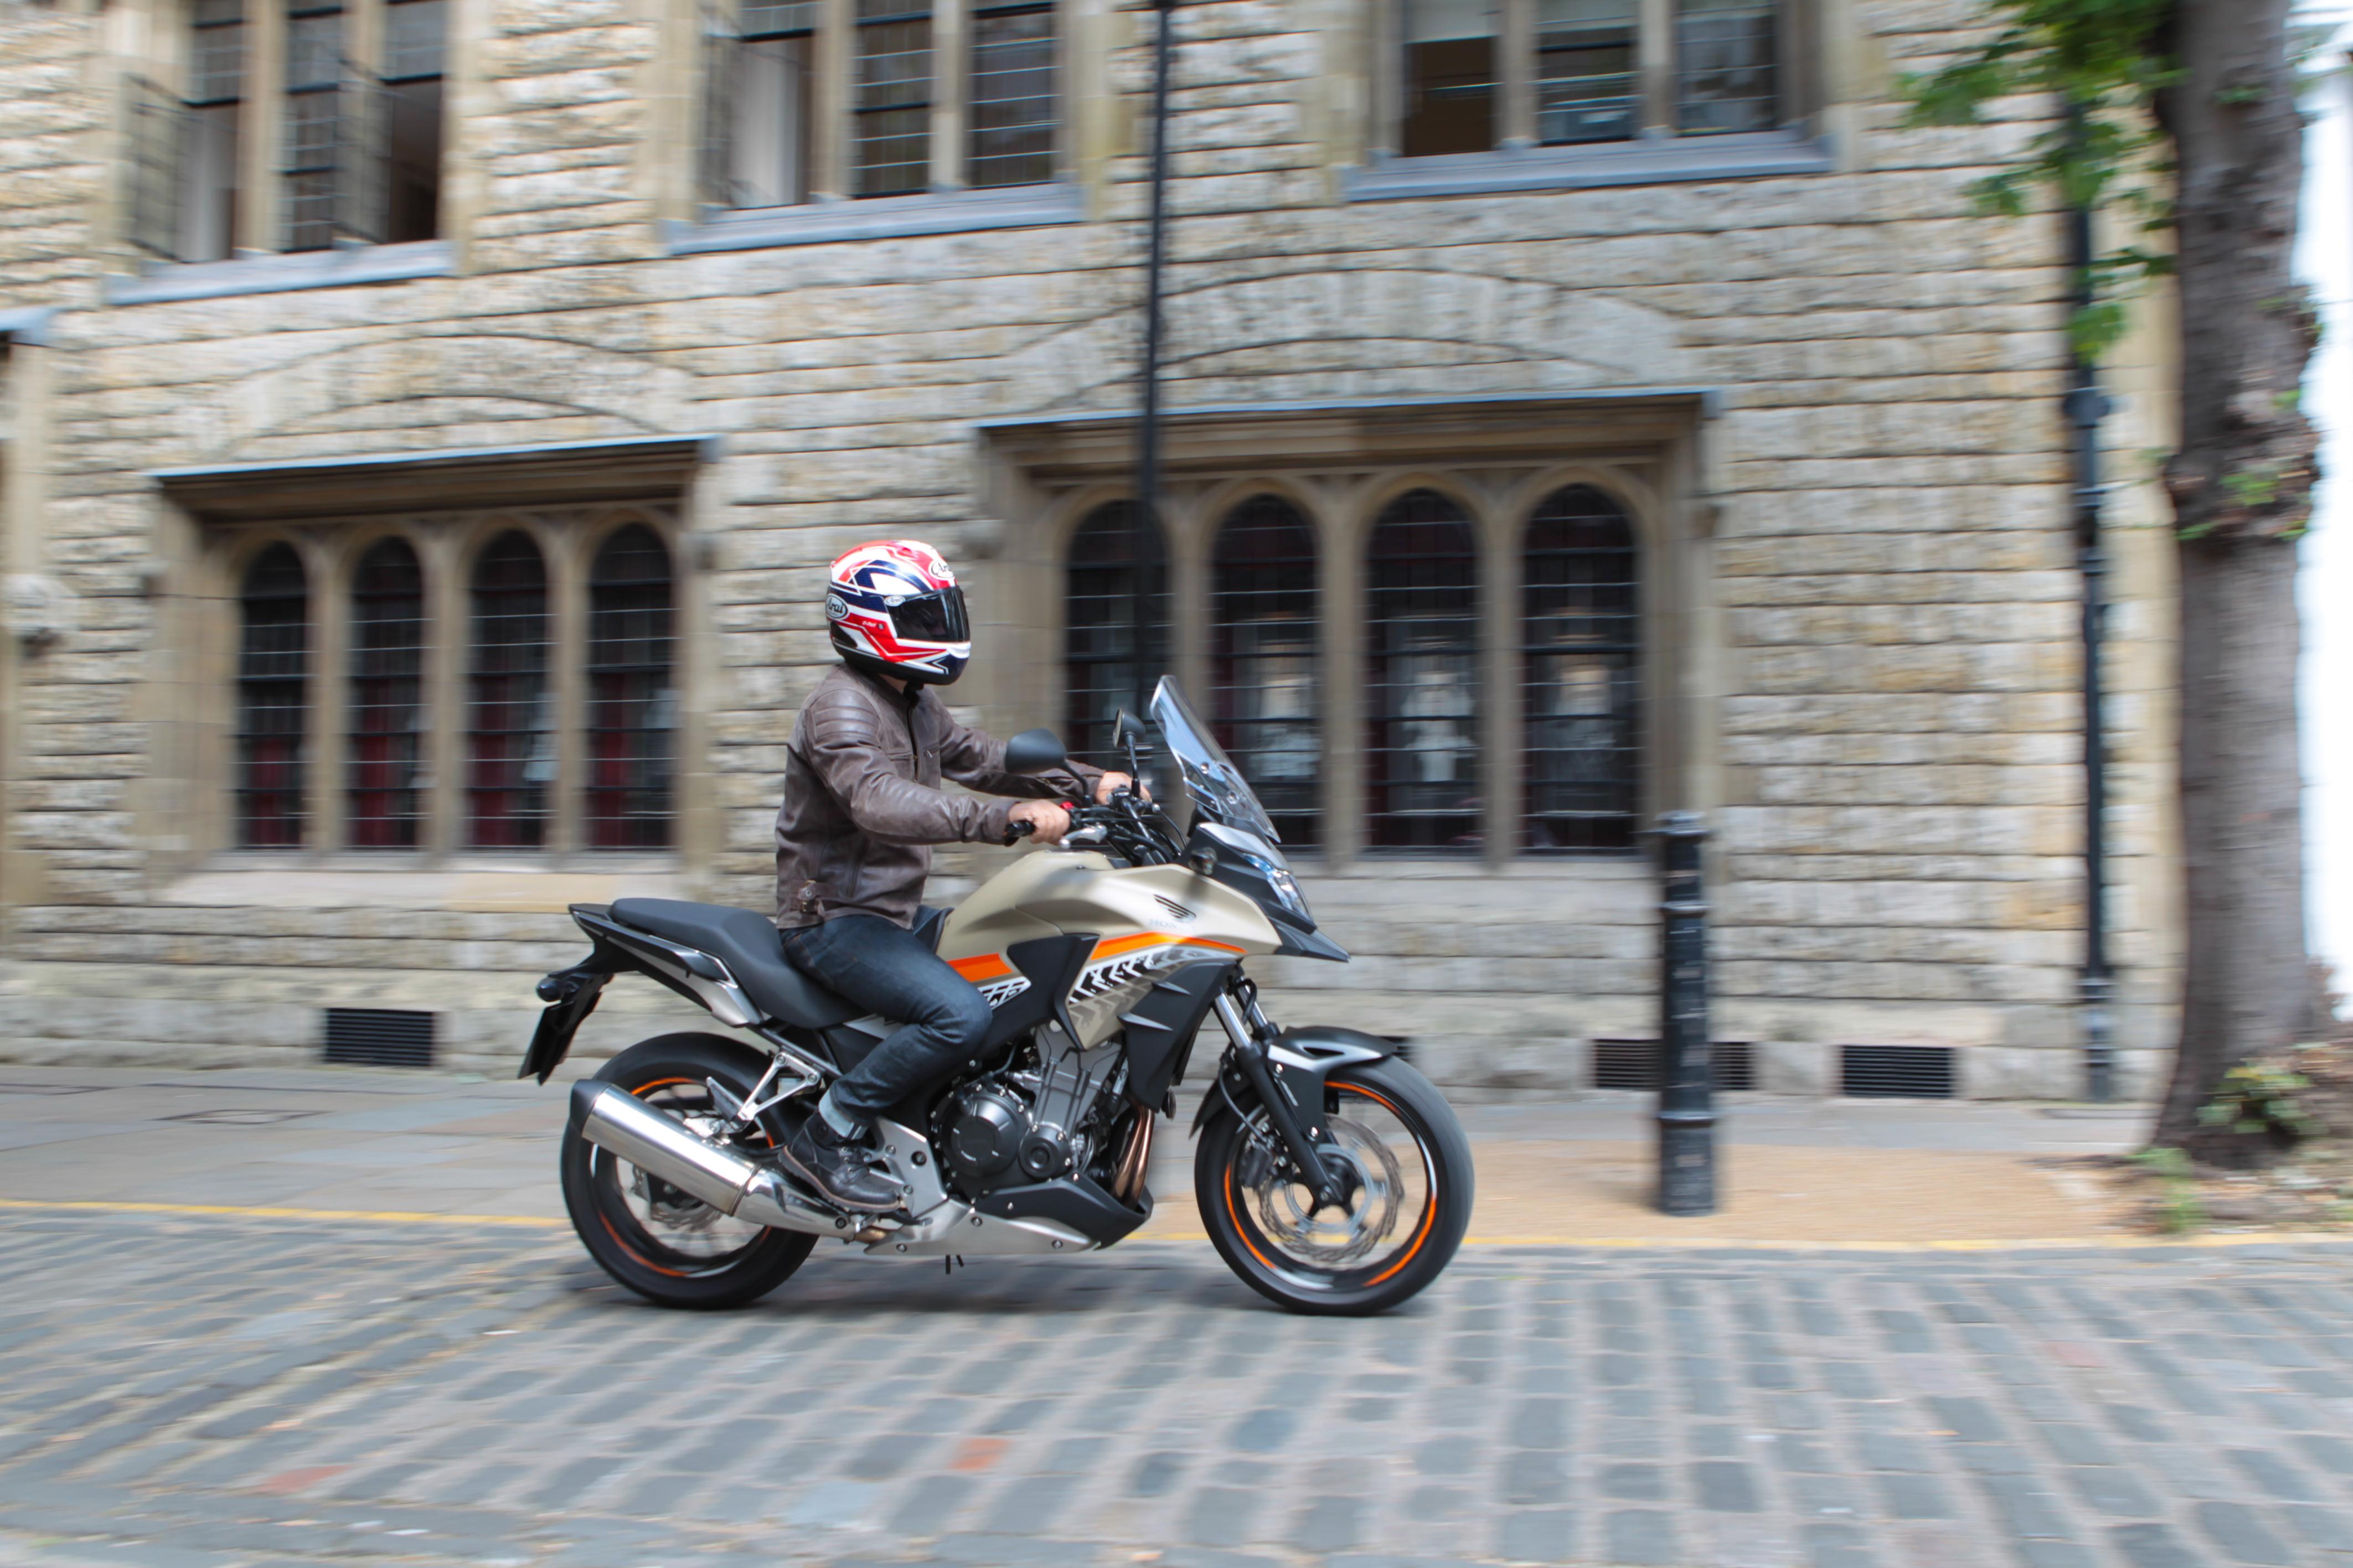 Honda cbx 500 review - Honda Cb500x